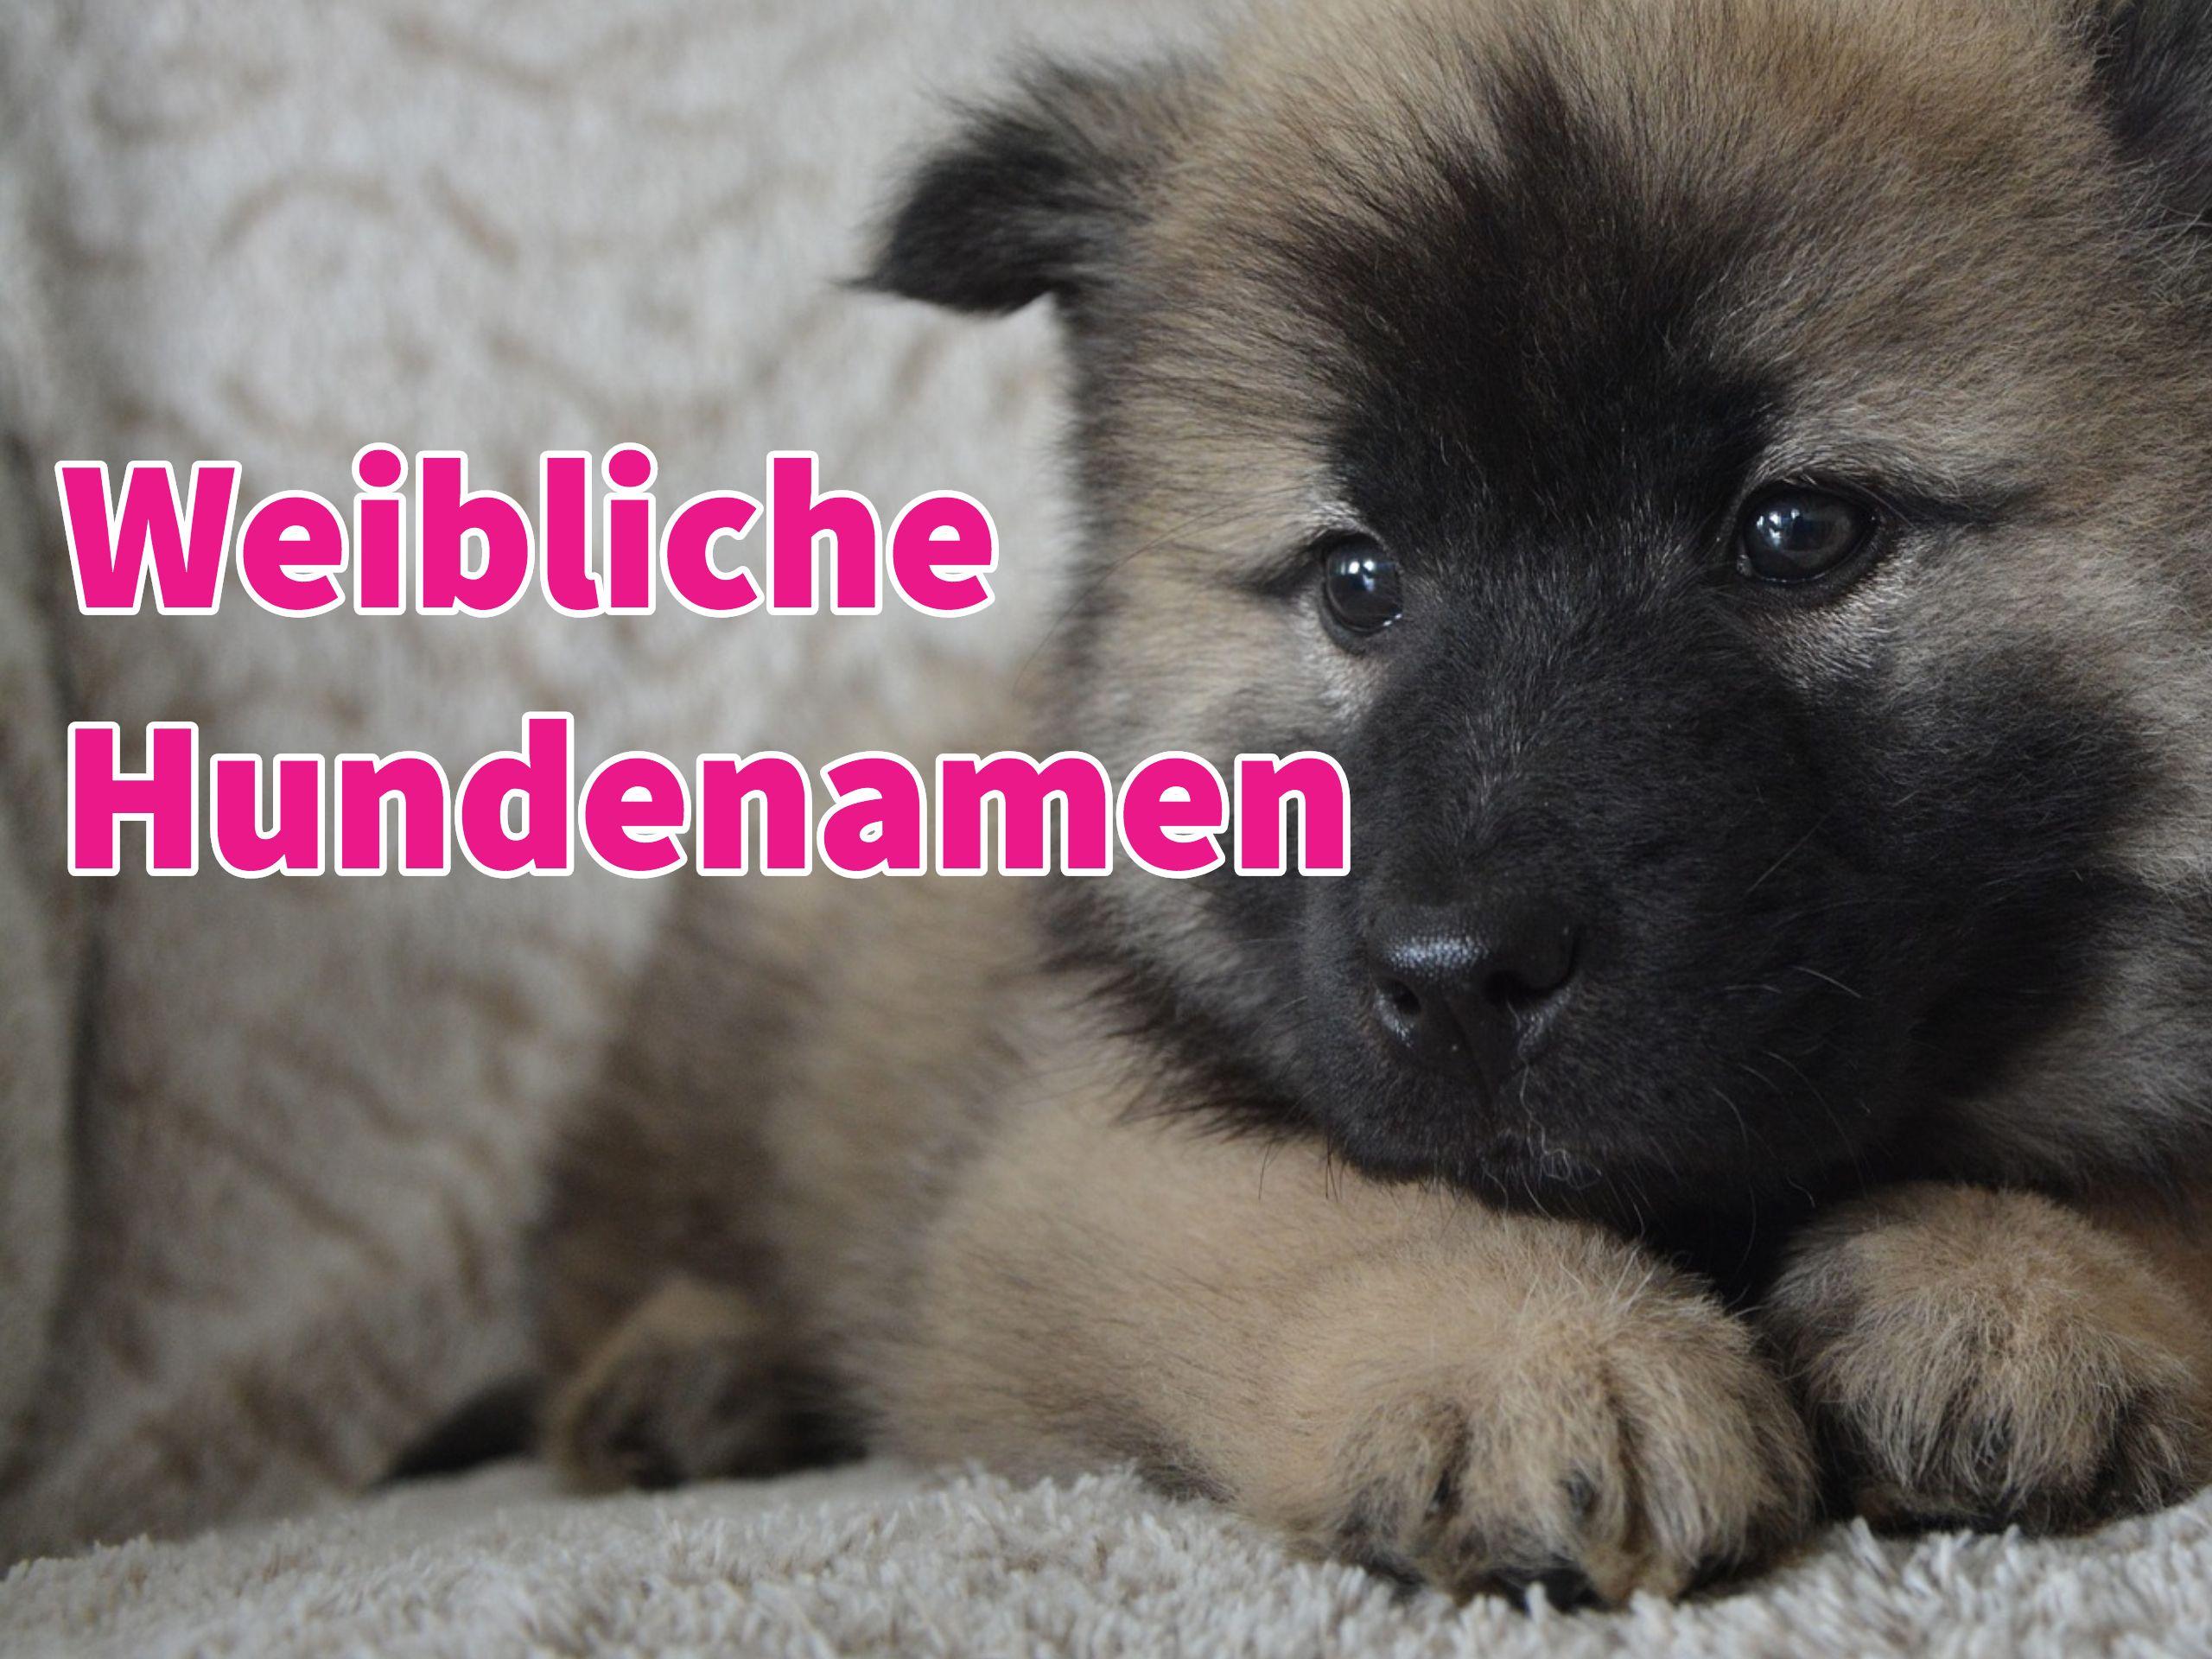 Weibliche Hundenamen Mit Bildern Weibliche Hundenamen Namen